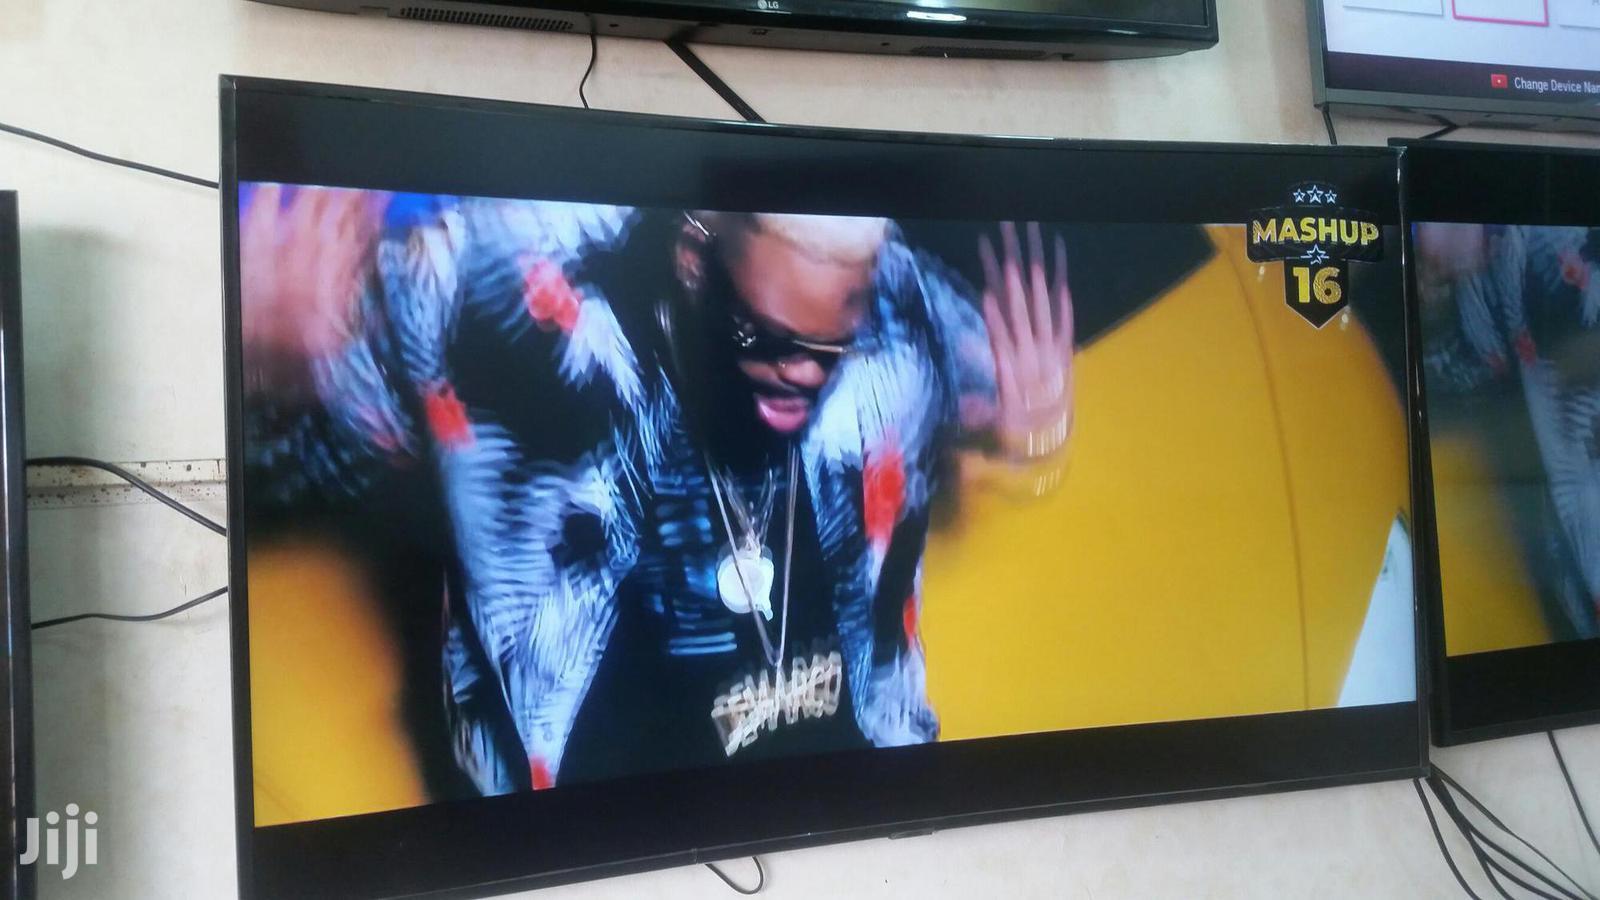 Samsung TV Curve 4k Ultra Hd 55 Inches | TV & DVD Equipment for sale in Kampala, Central Region, Uganda